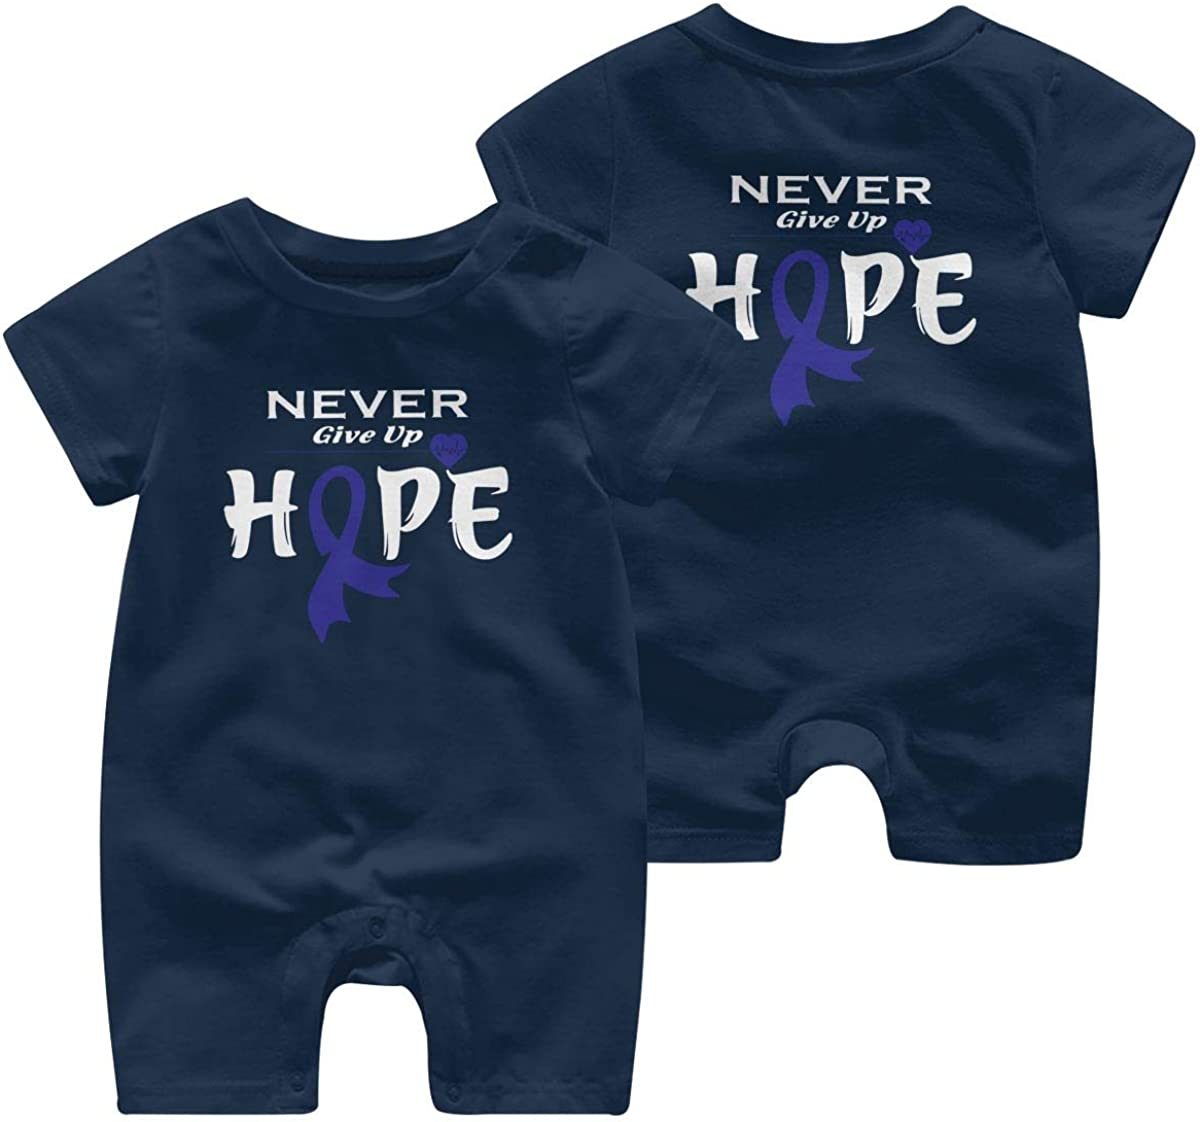 Mri-le1 Newborn Baby Bodysuits Colon Cancer Awareness-1 Infant Short Sleeve Romper Jumpsuit